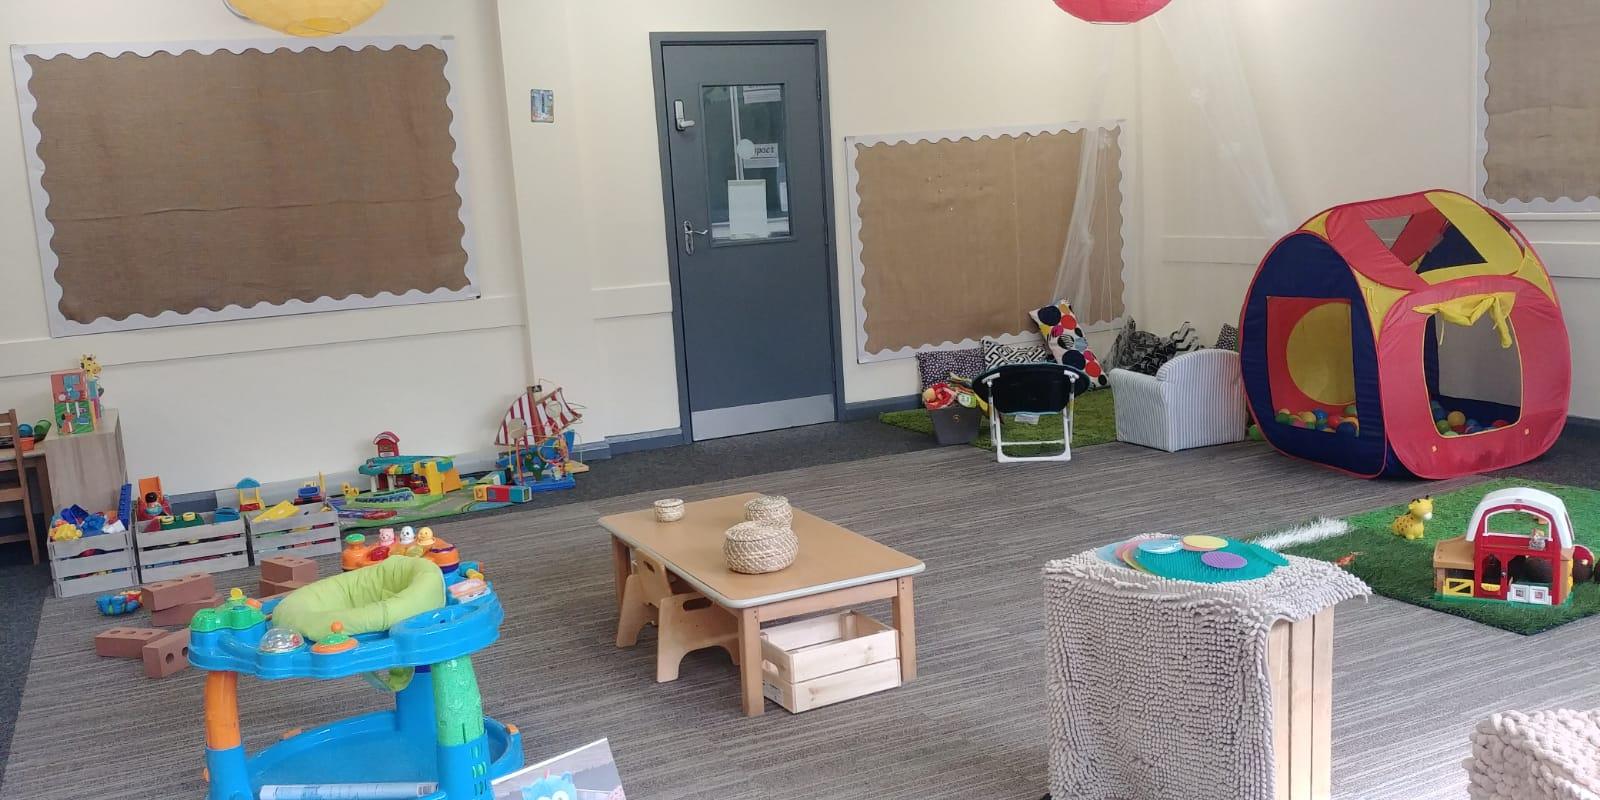 Notts-based company supports opening of new Sunrise Nurseries